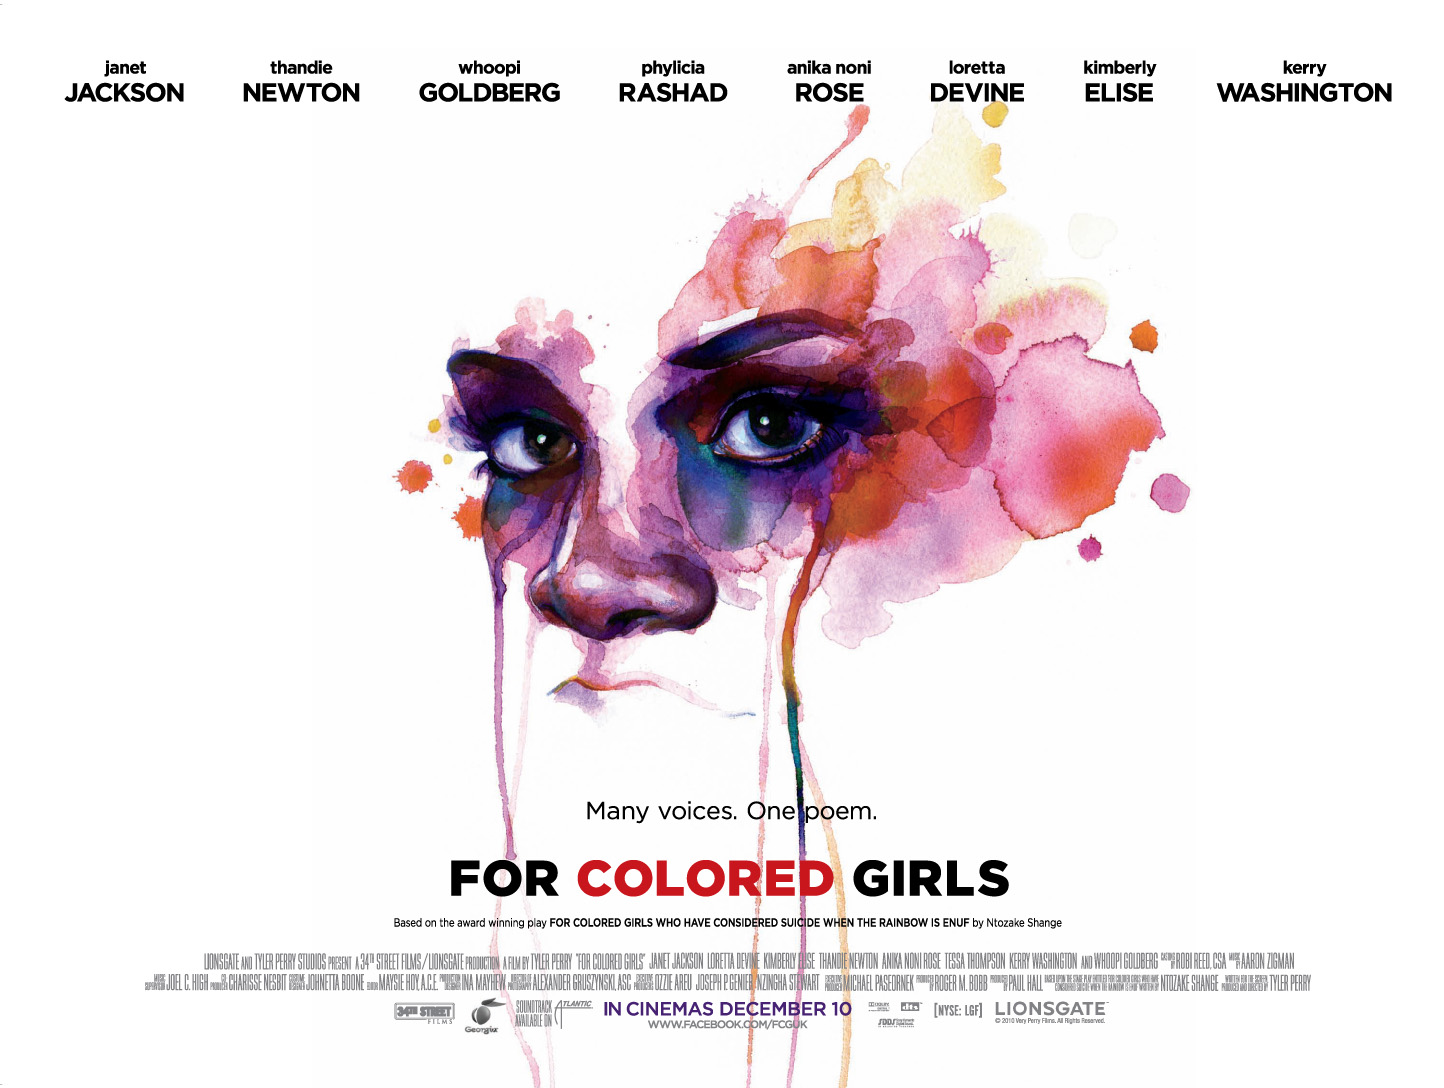 http://1.bp.blogspot.com/_BvFFUsPQpFU/TSPpI8tVknI/AAAAAAAAAq8/4wFAnXMyPSE/s1600/For-Colored-Girls-UK-Poster.jpg